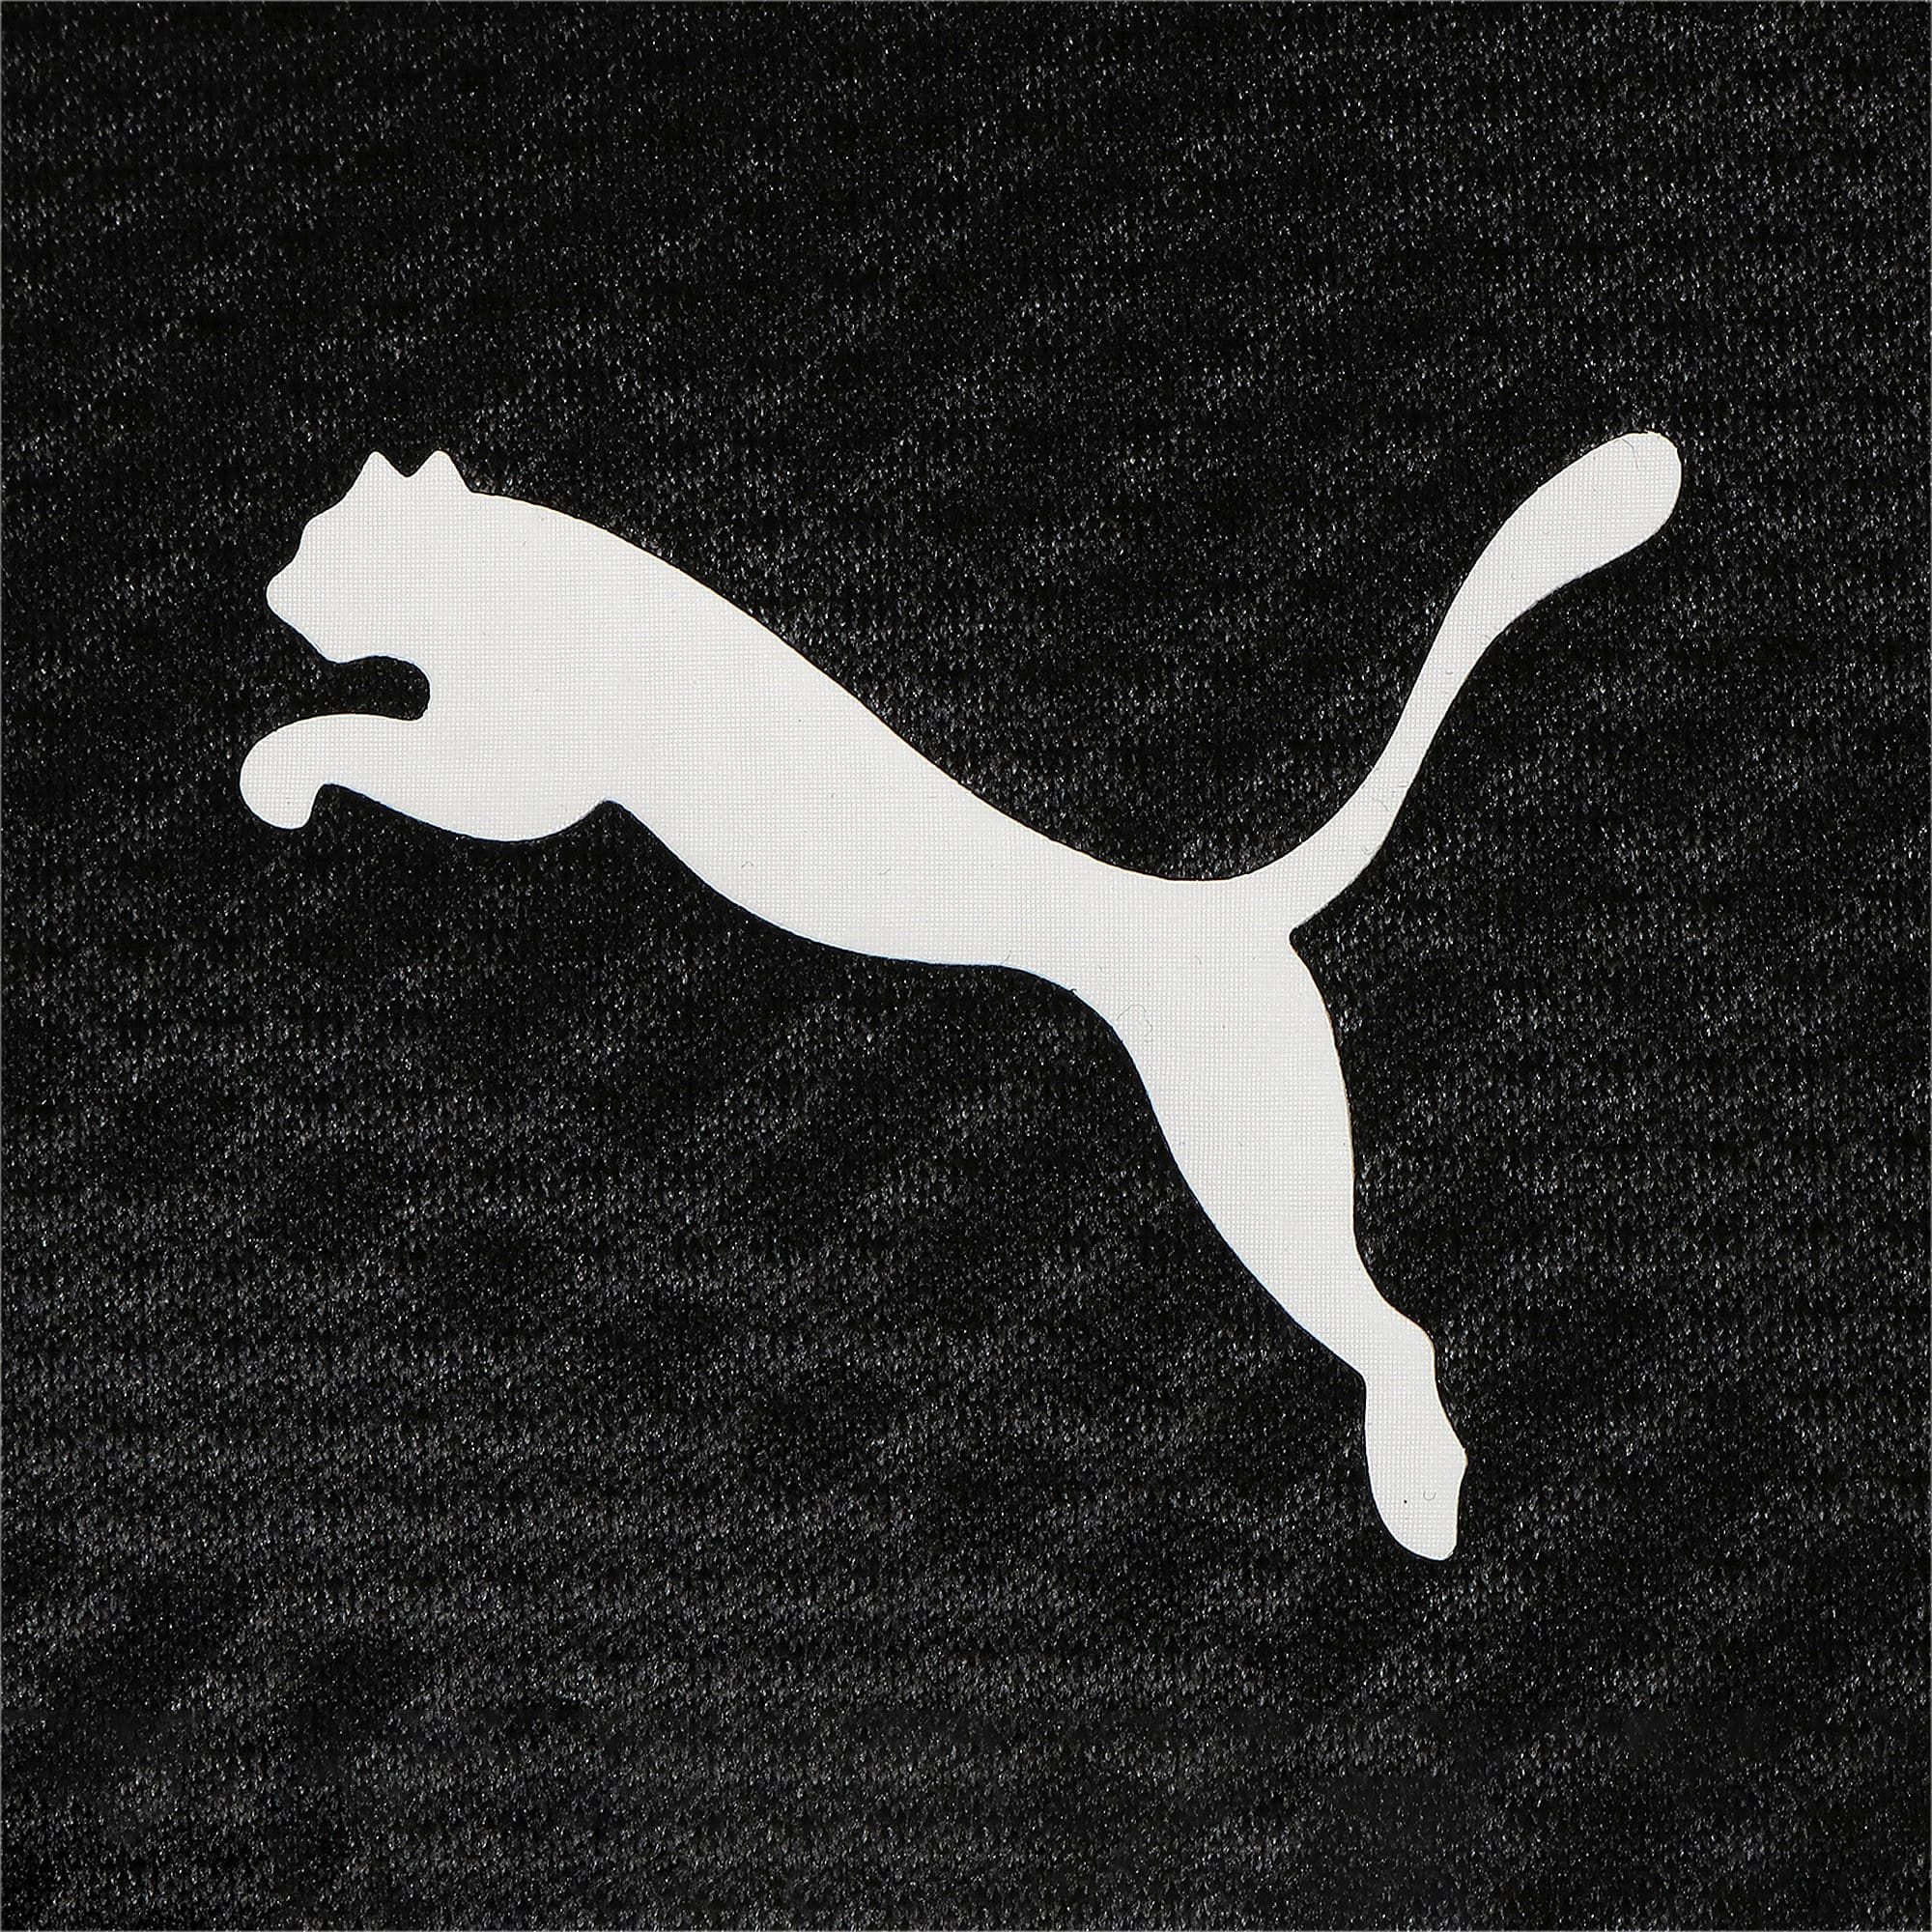 Thumbnail 4 of カップ トレーニング 1/4 ジップ コア, Puma Black-Asphalt, medium-JPN